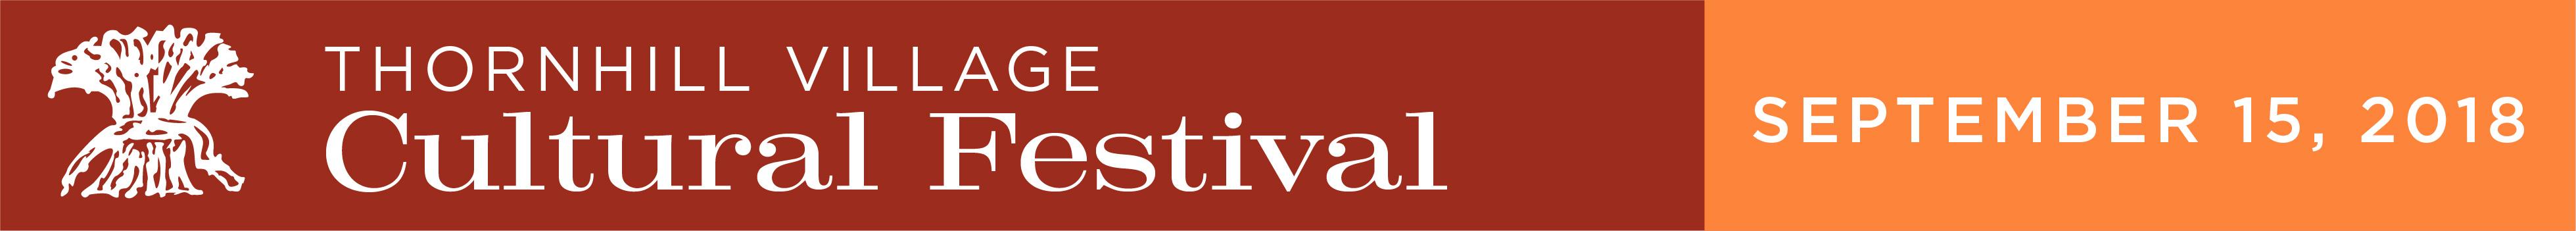 Thornhill Village Cultural Festival